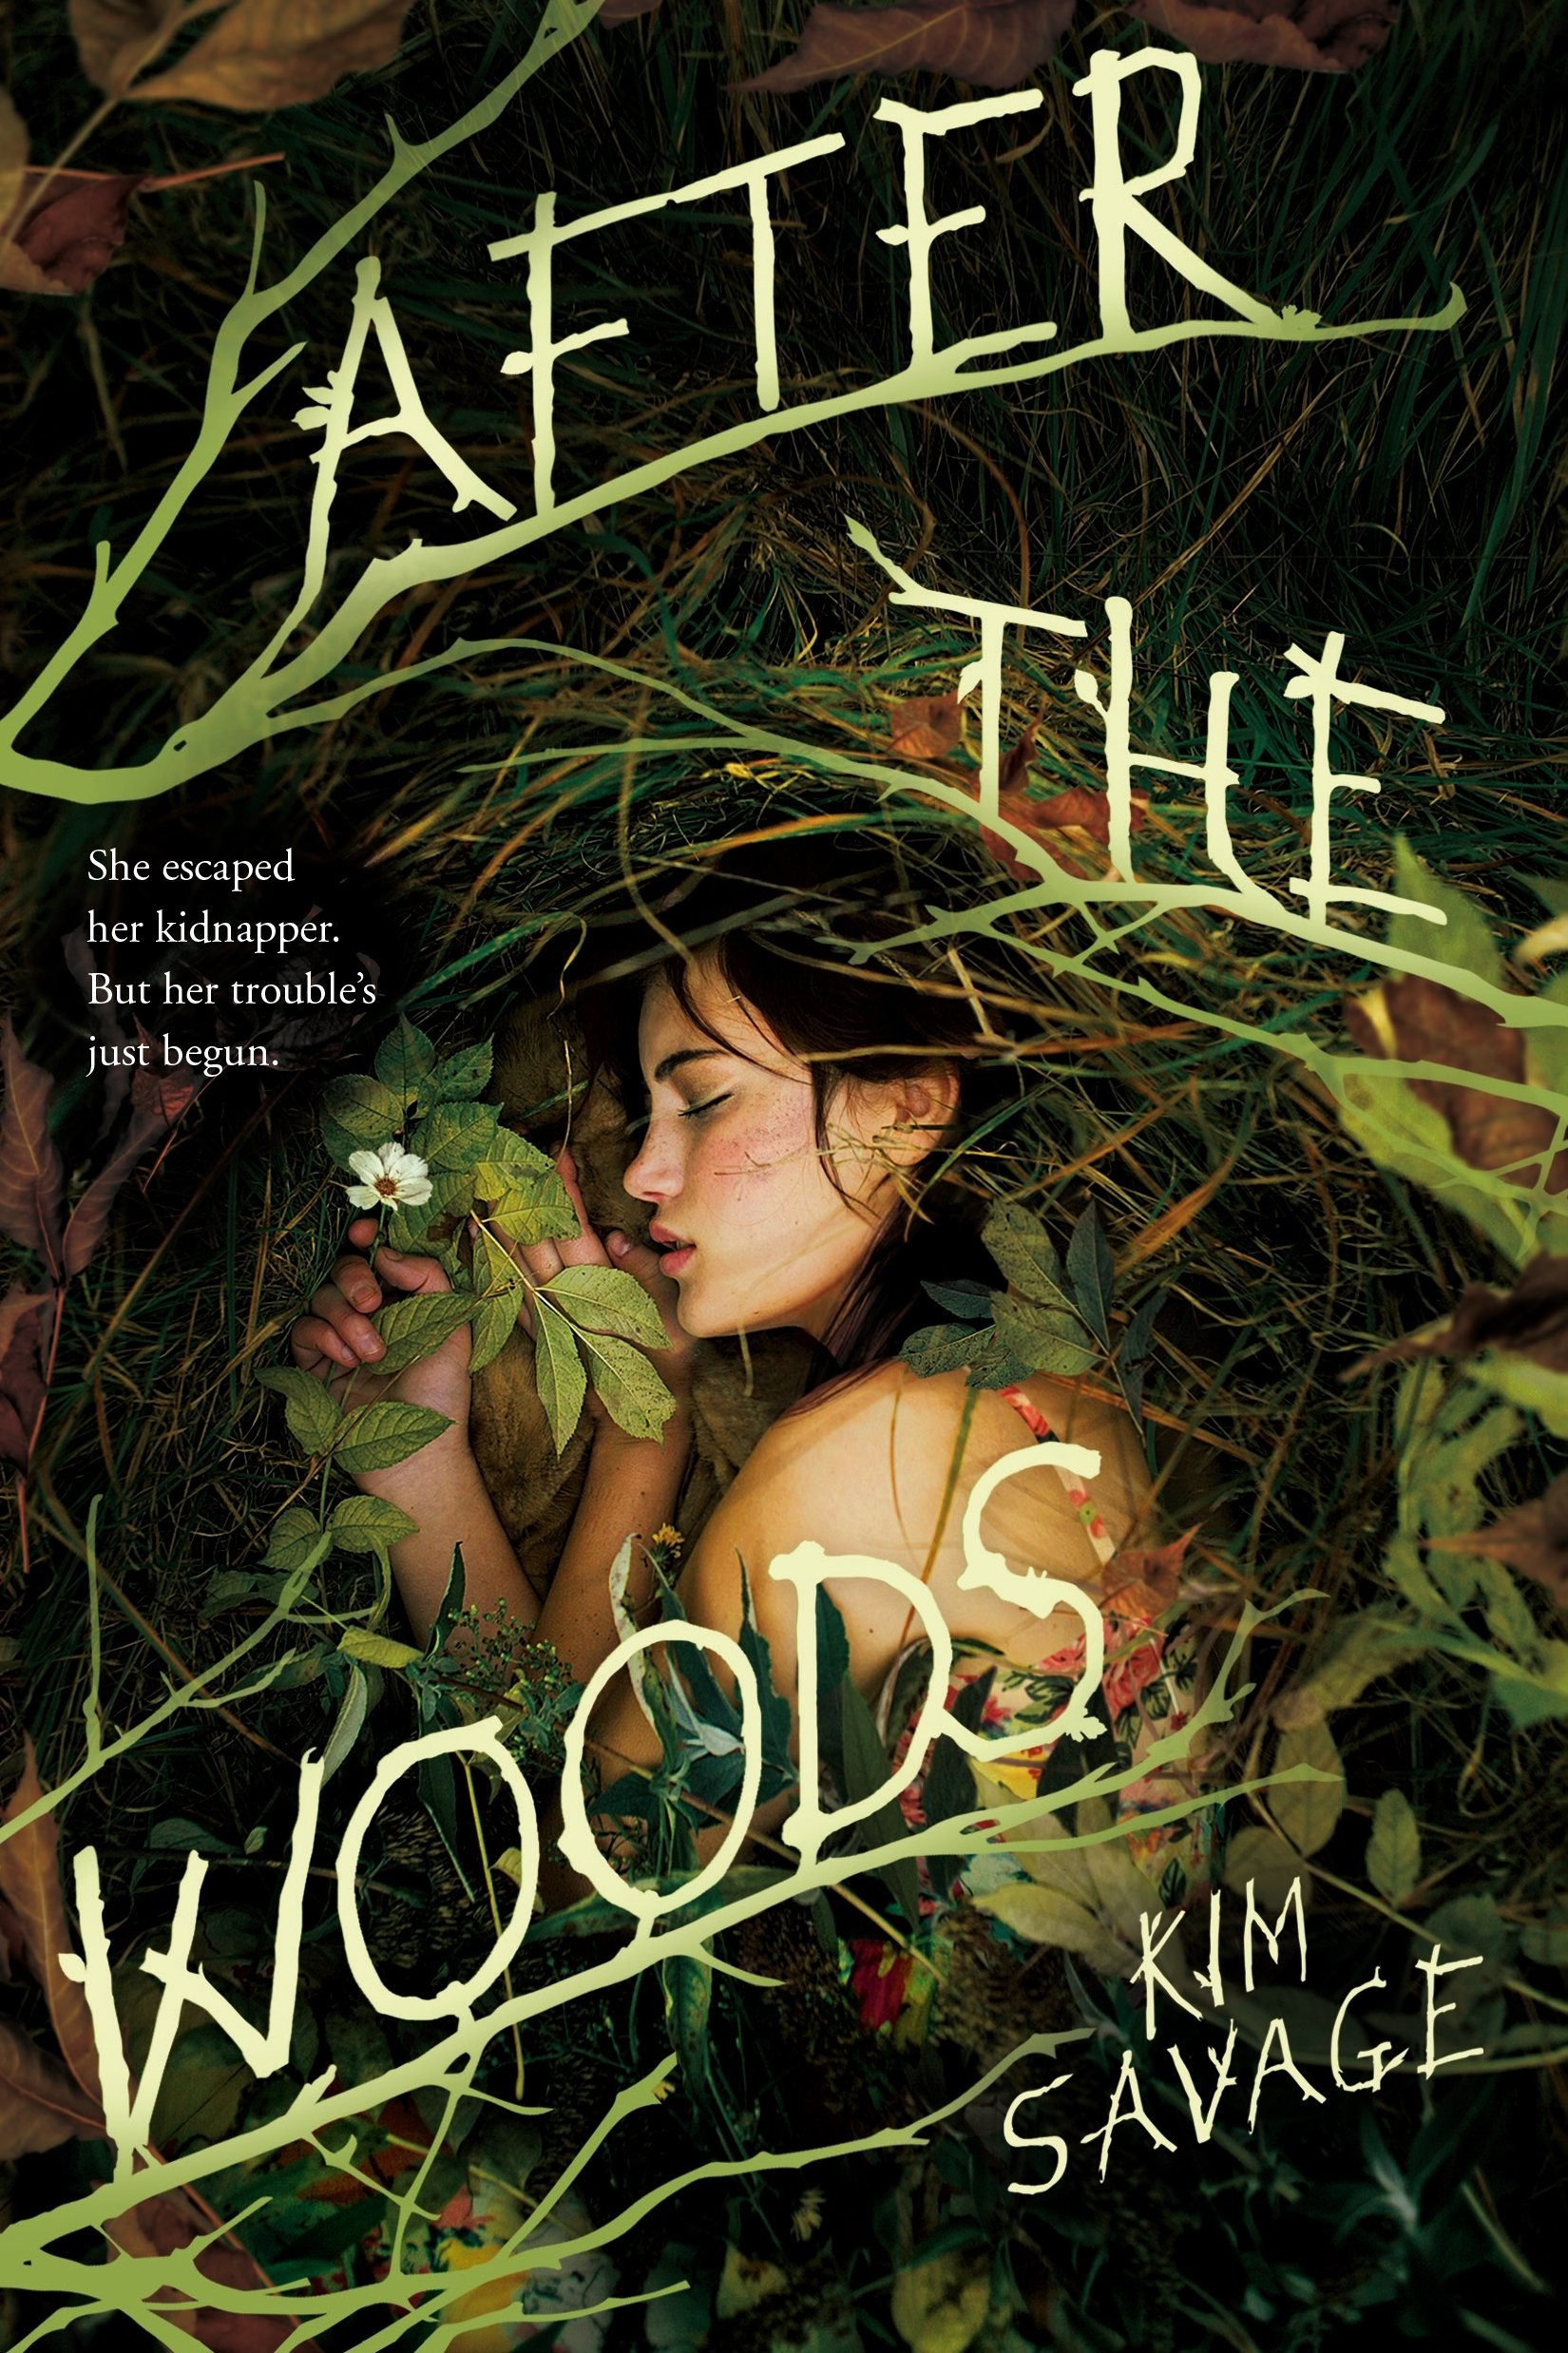 Amazon.com: After the Woods (9781250104304): Kim Savage: Books